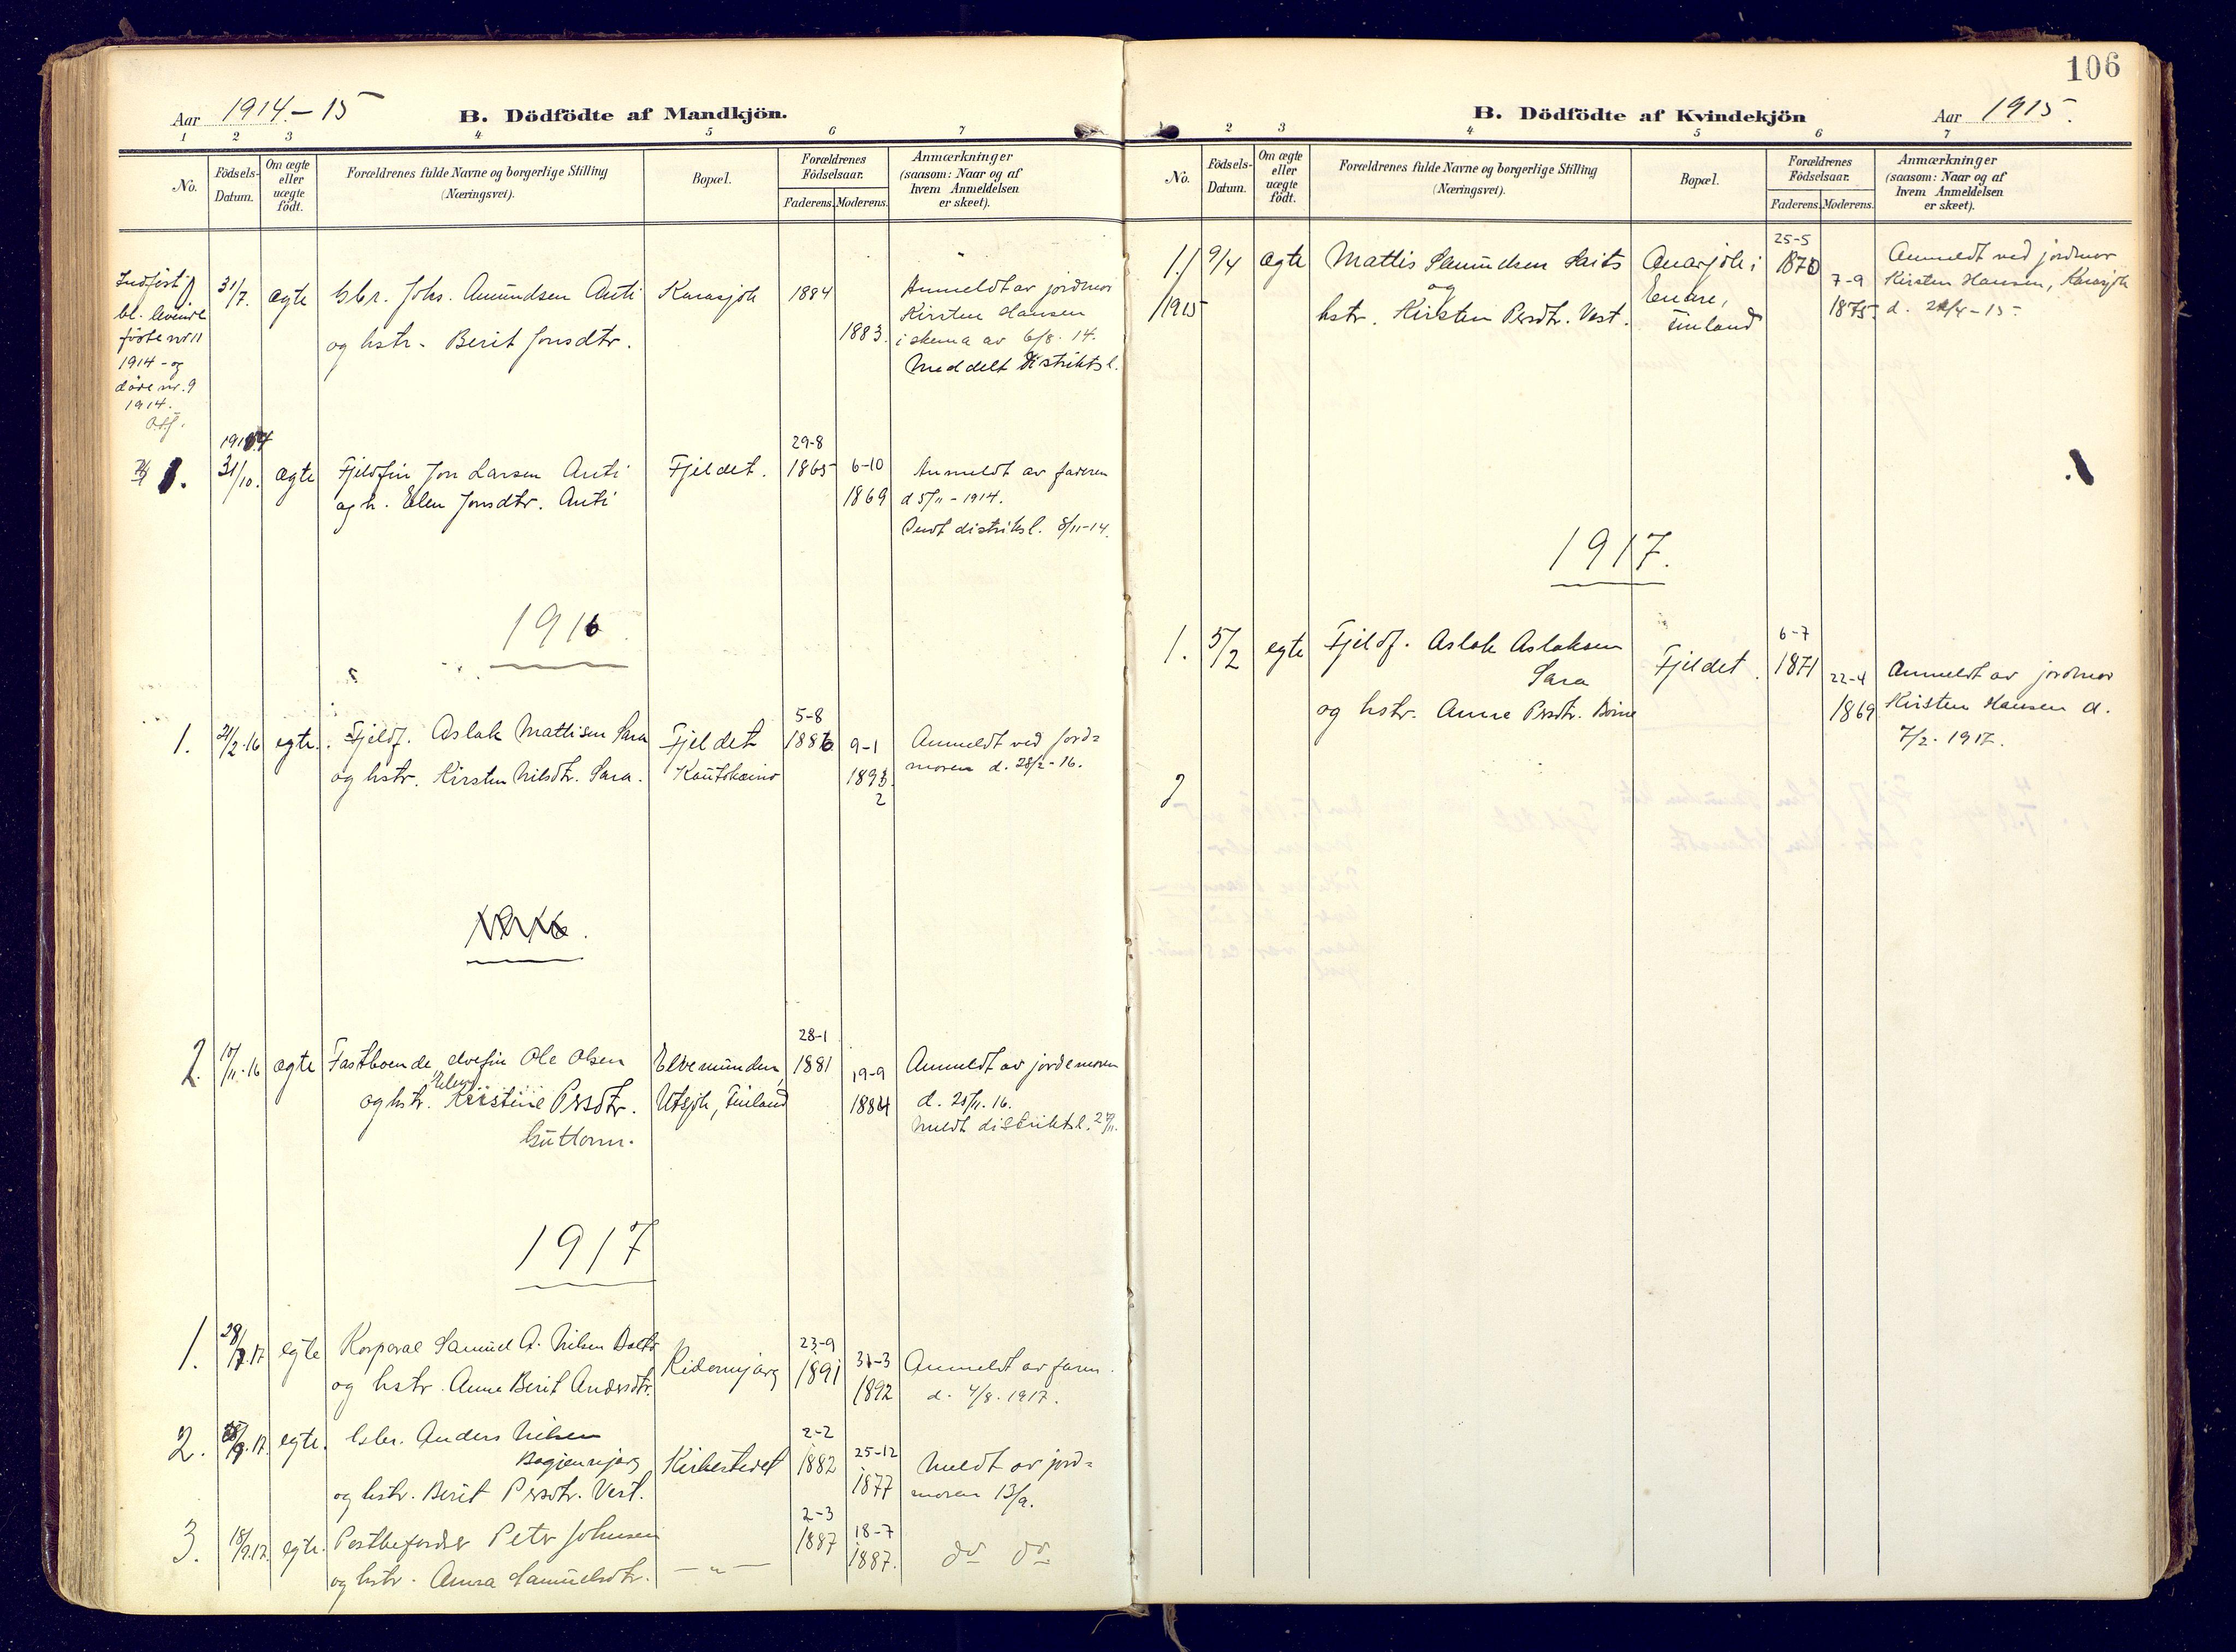 SATØ, Karasjok sokneprestkontor, H/Ha: Ministerialbok nr. 3, 1907-1926, s. 106